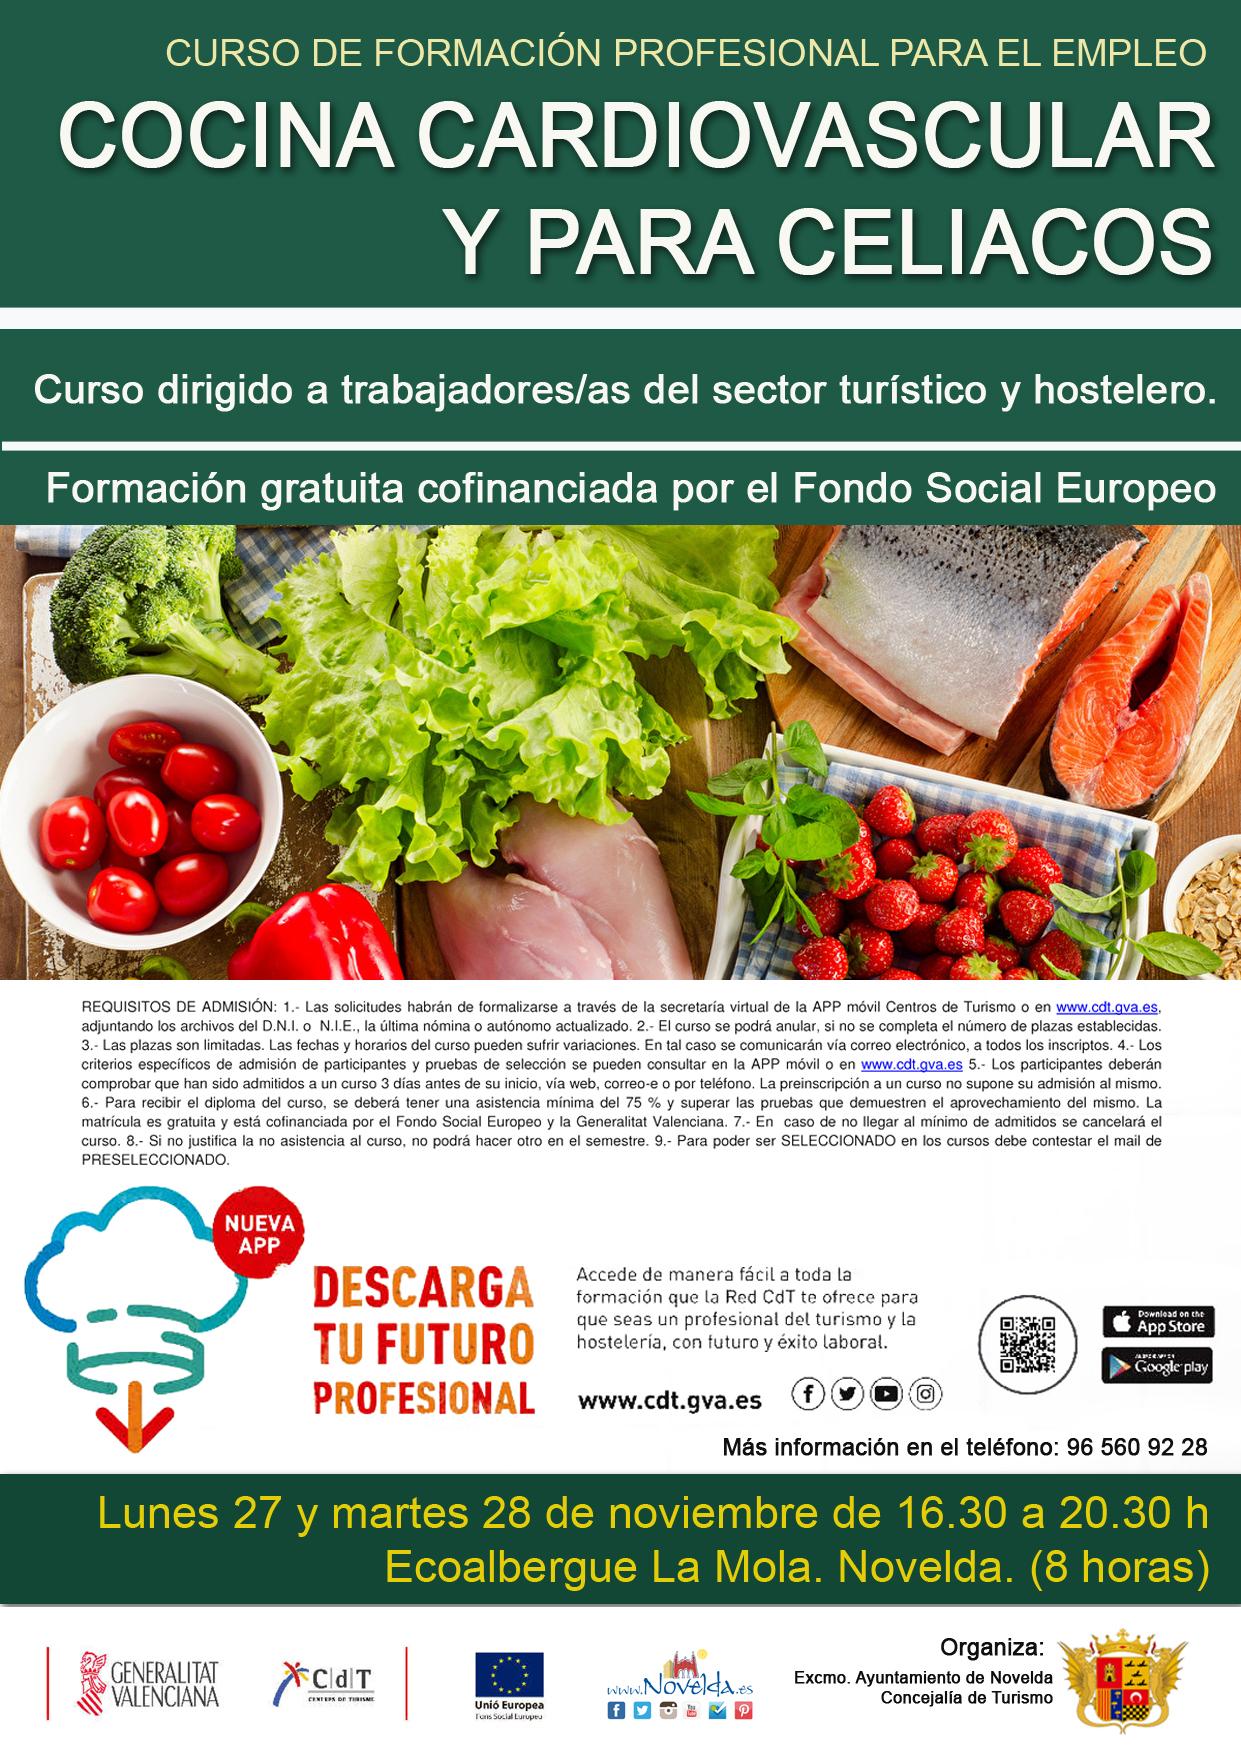 Curso cocina cardiovascular y celiacos web novelda turismo - Curso de cocina para solteros ...